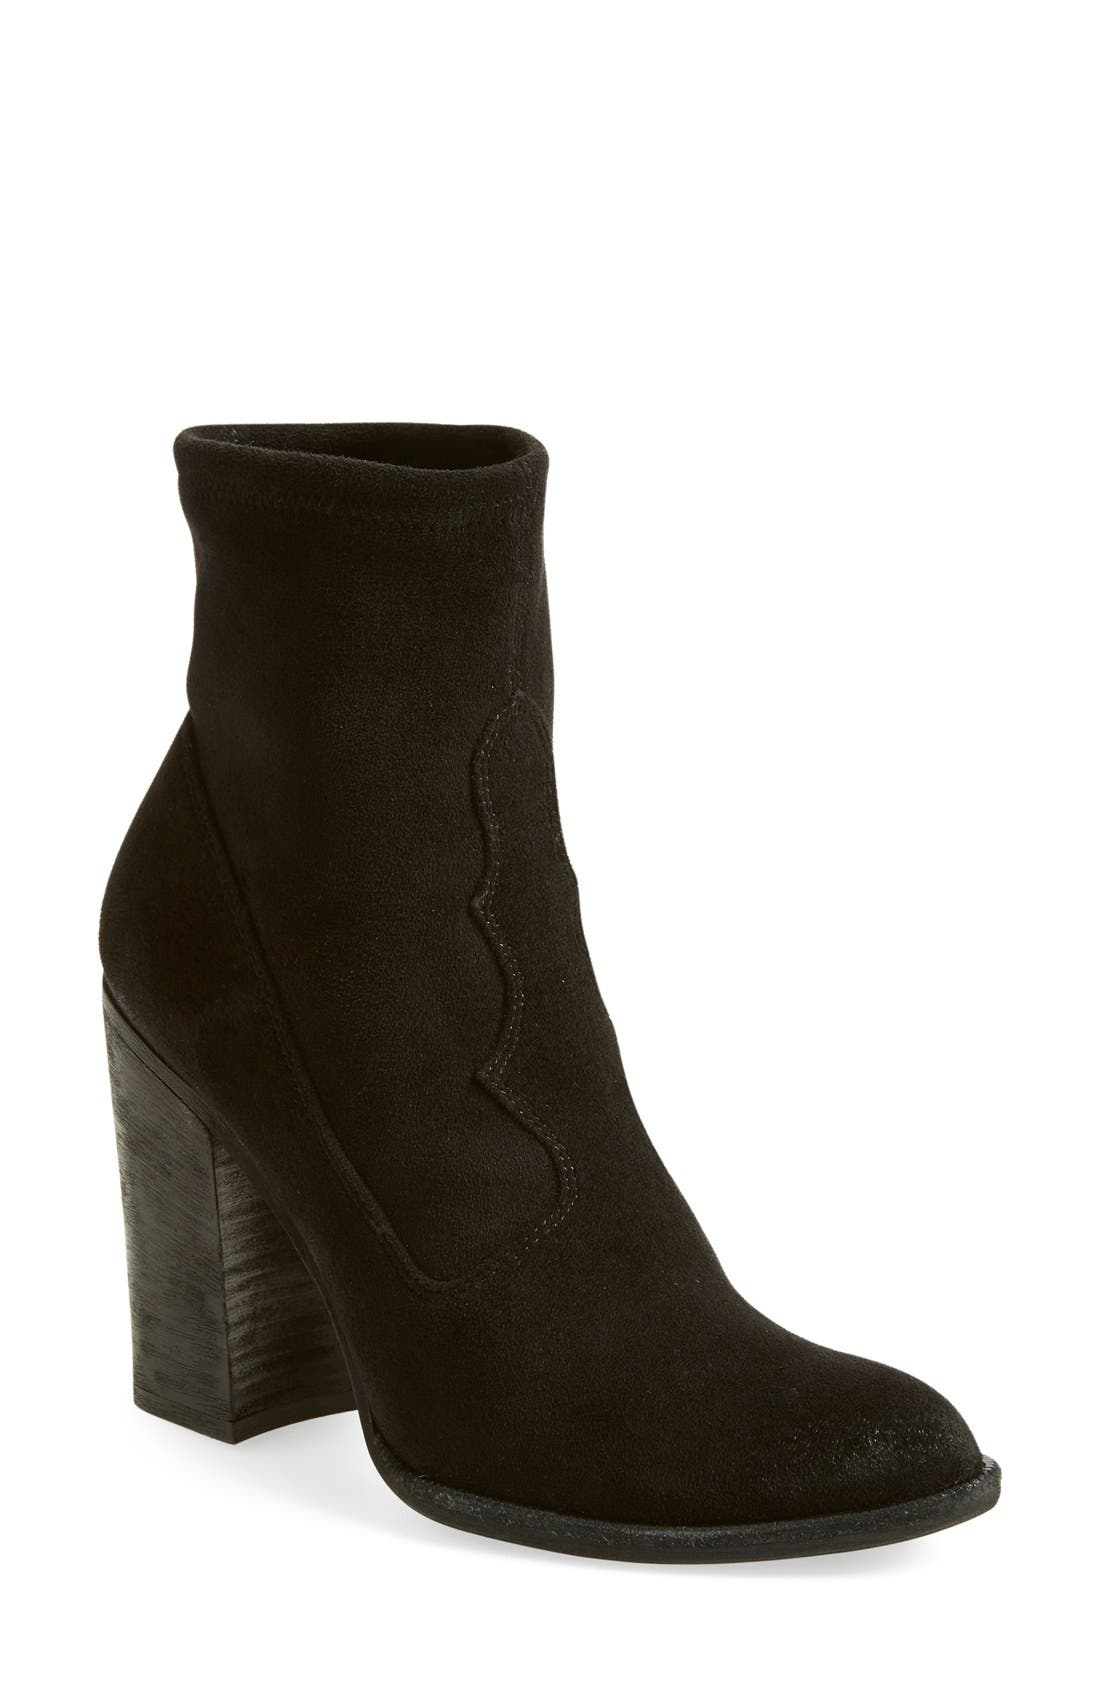 Alternate Image 1 Selected - Dolce Vita 'Cammi' Boot (Women)